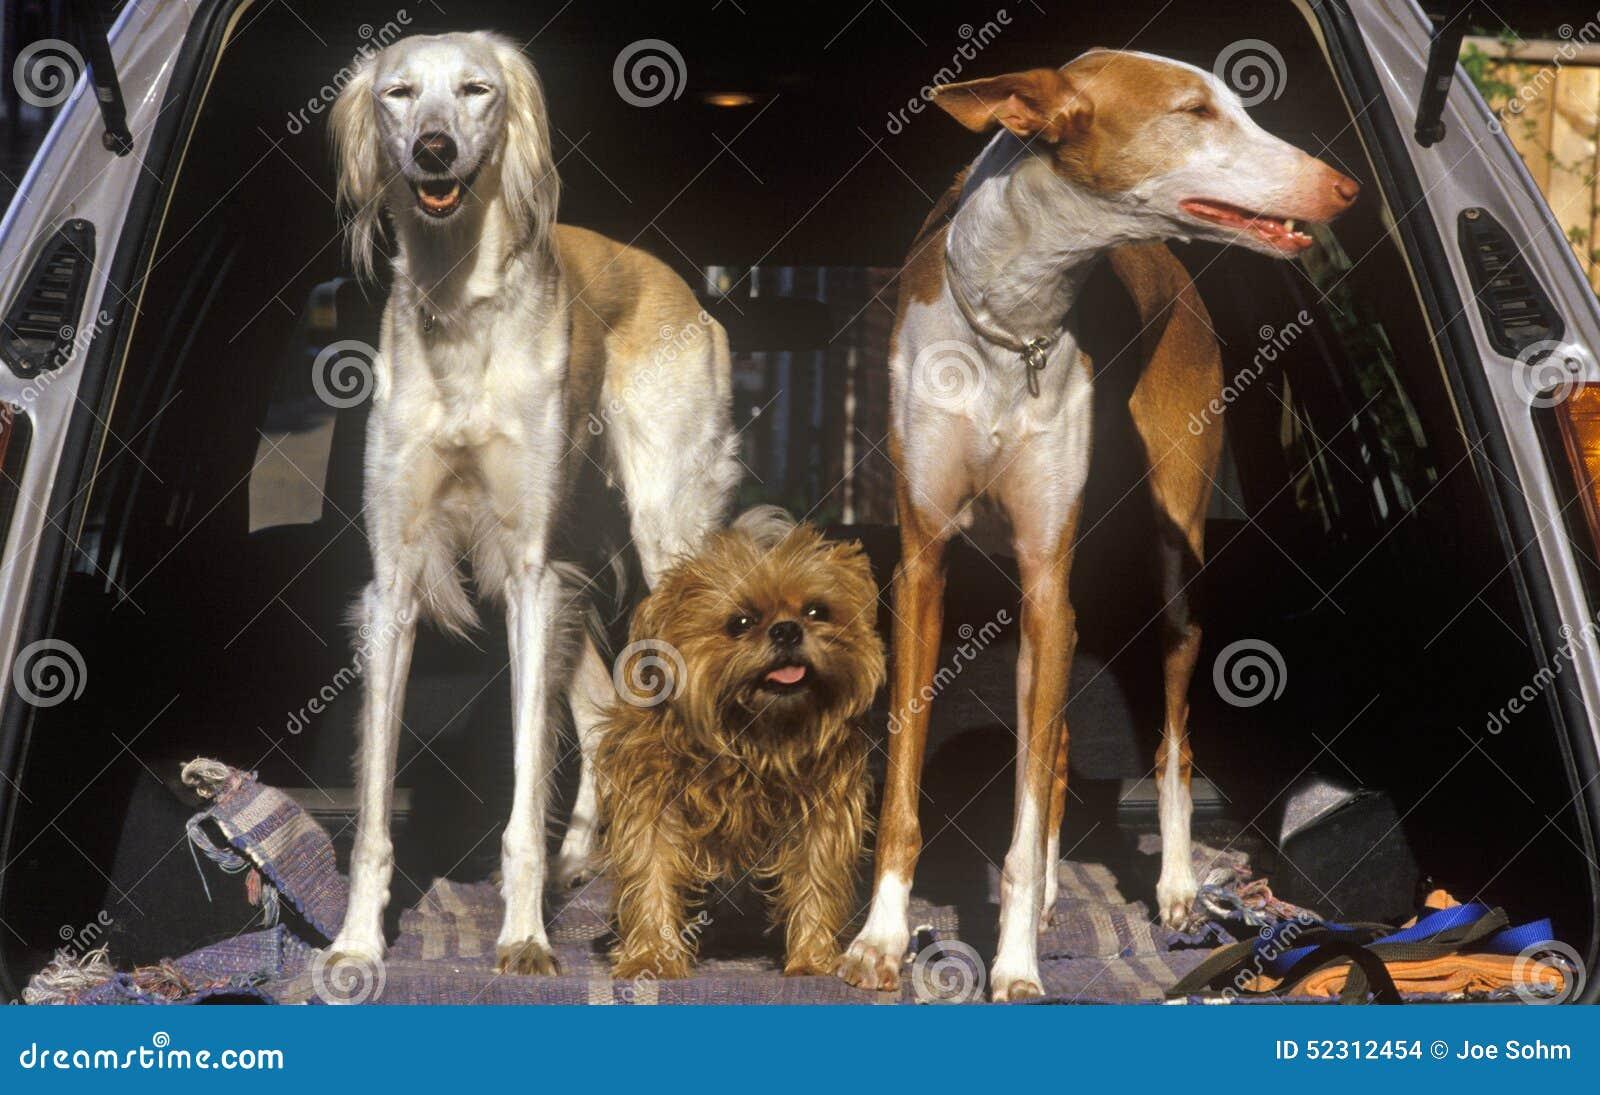 Three dogs in back of car, Alexandria, Washington, DC